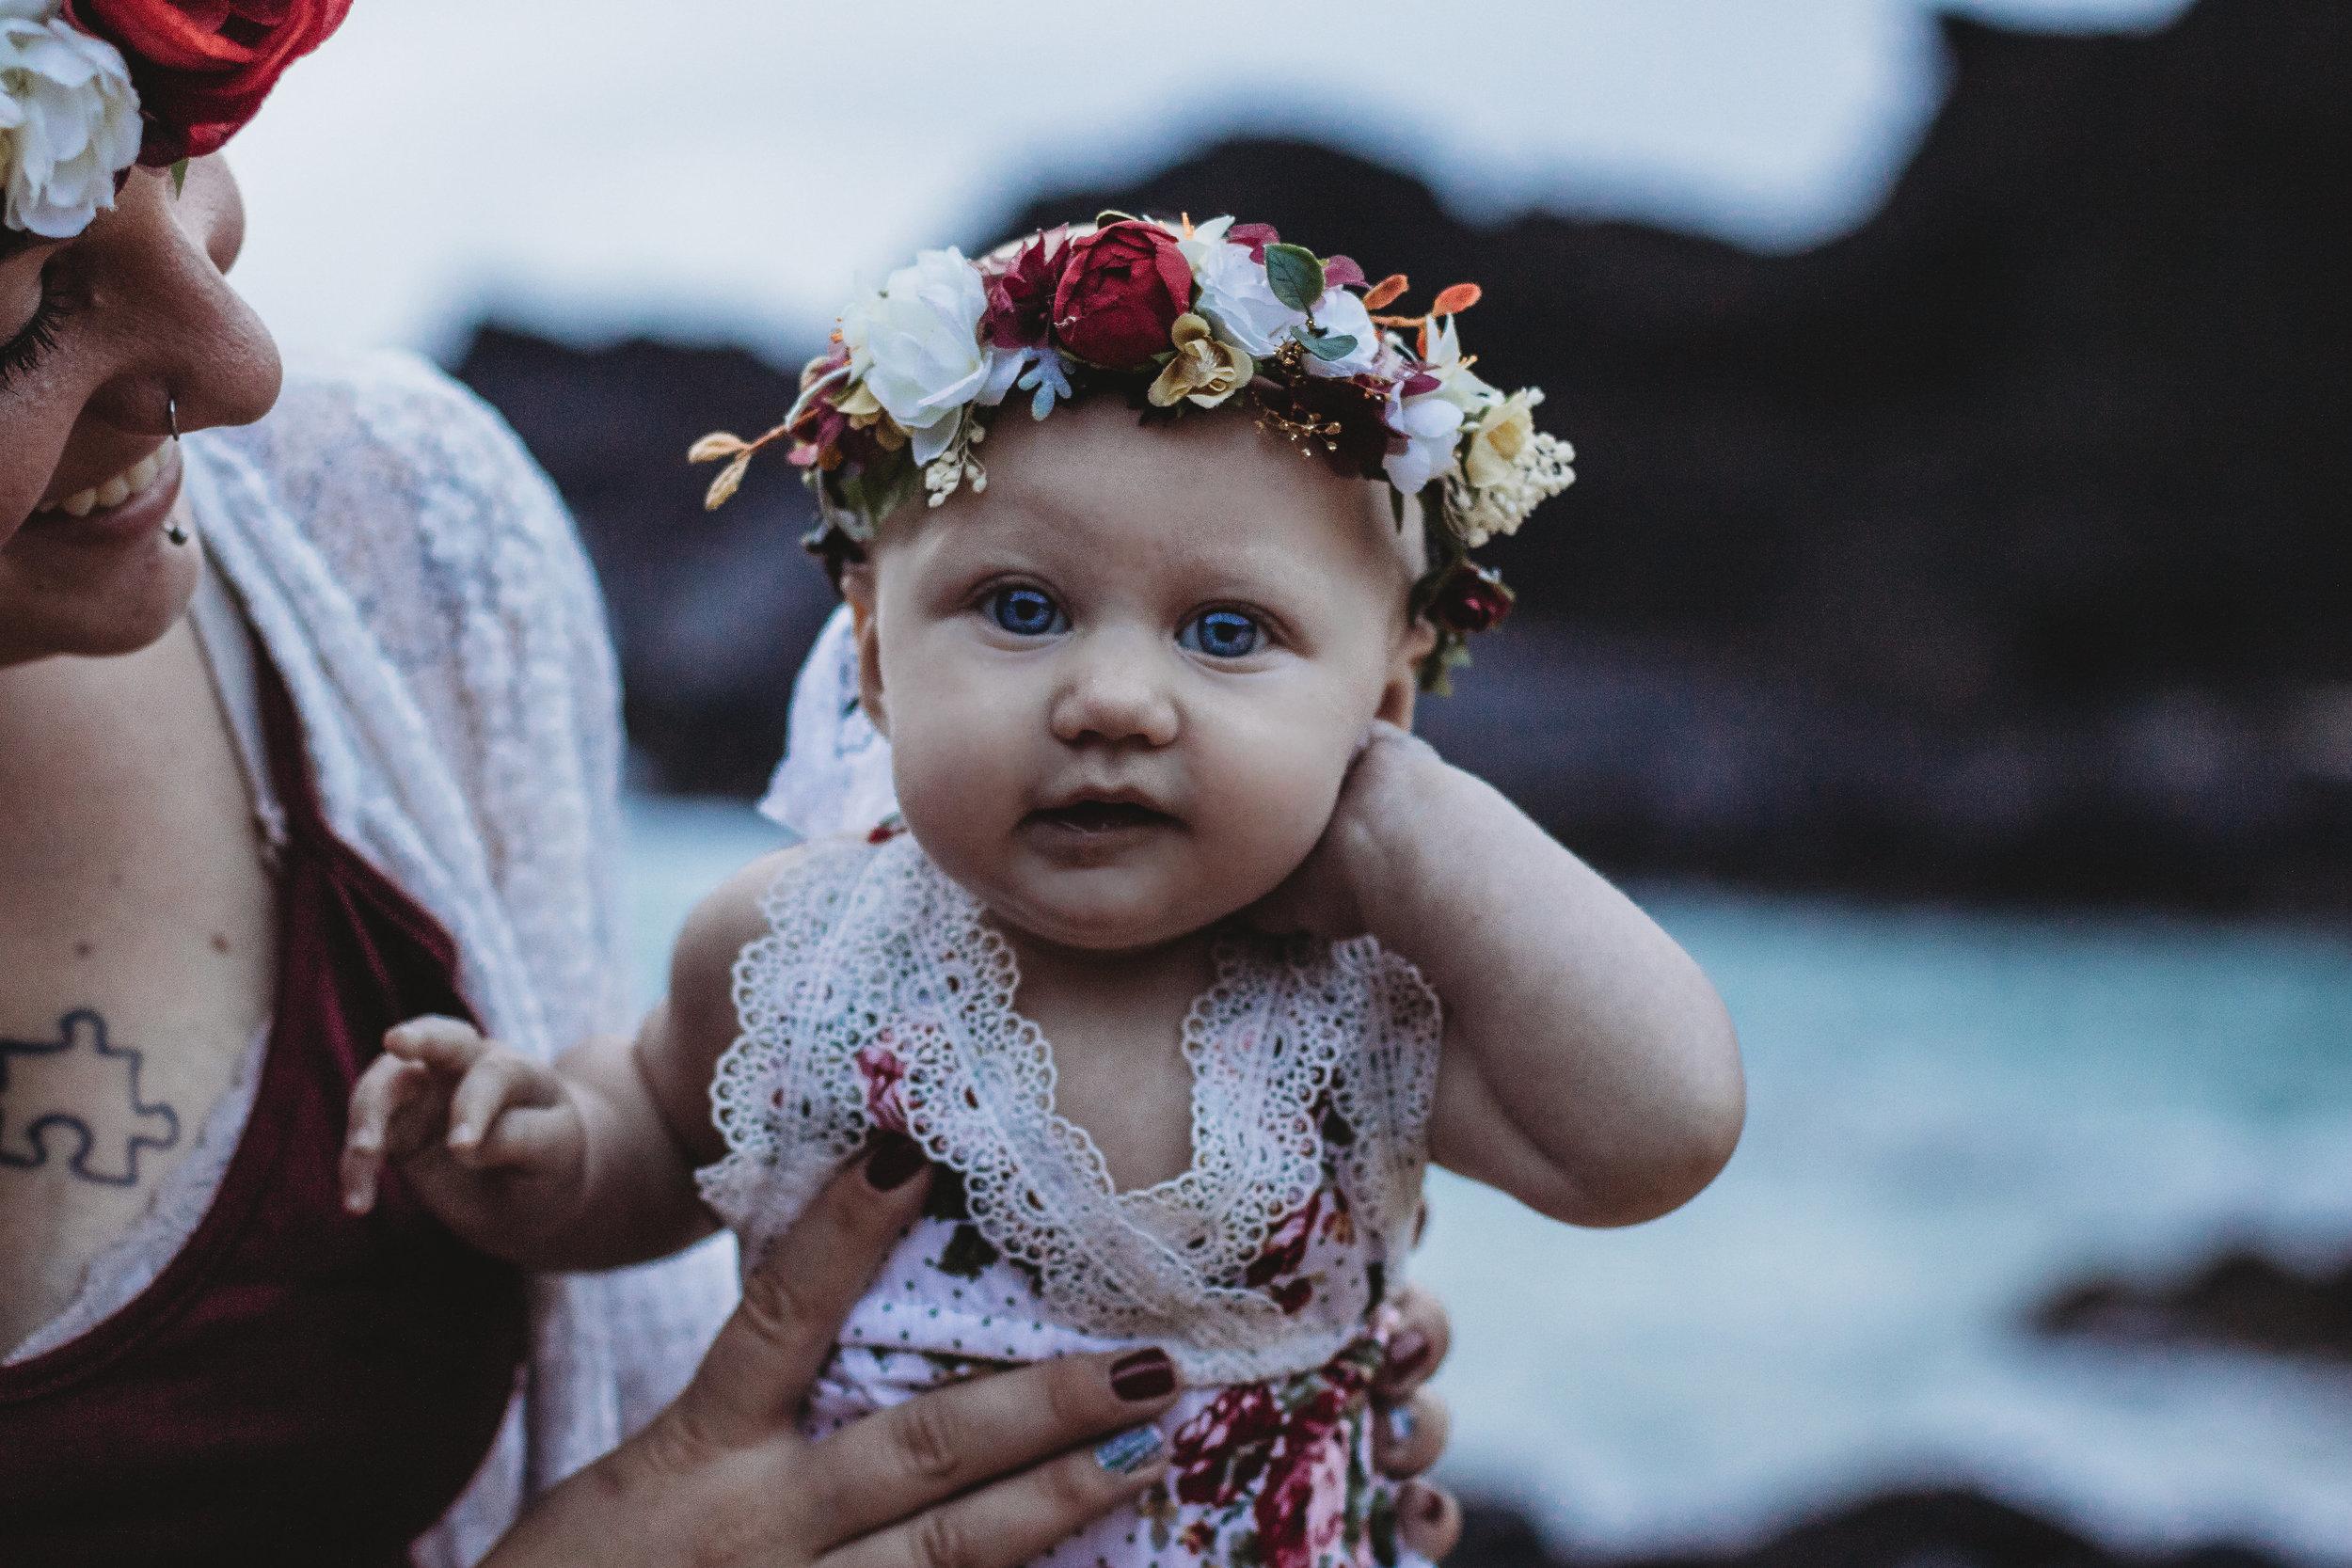 Mother and baby on Hawaii Beach nursing photo shoot